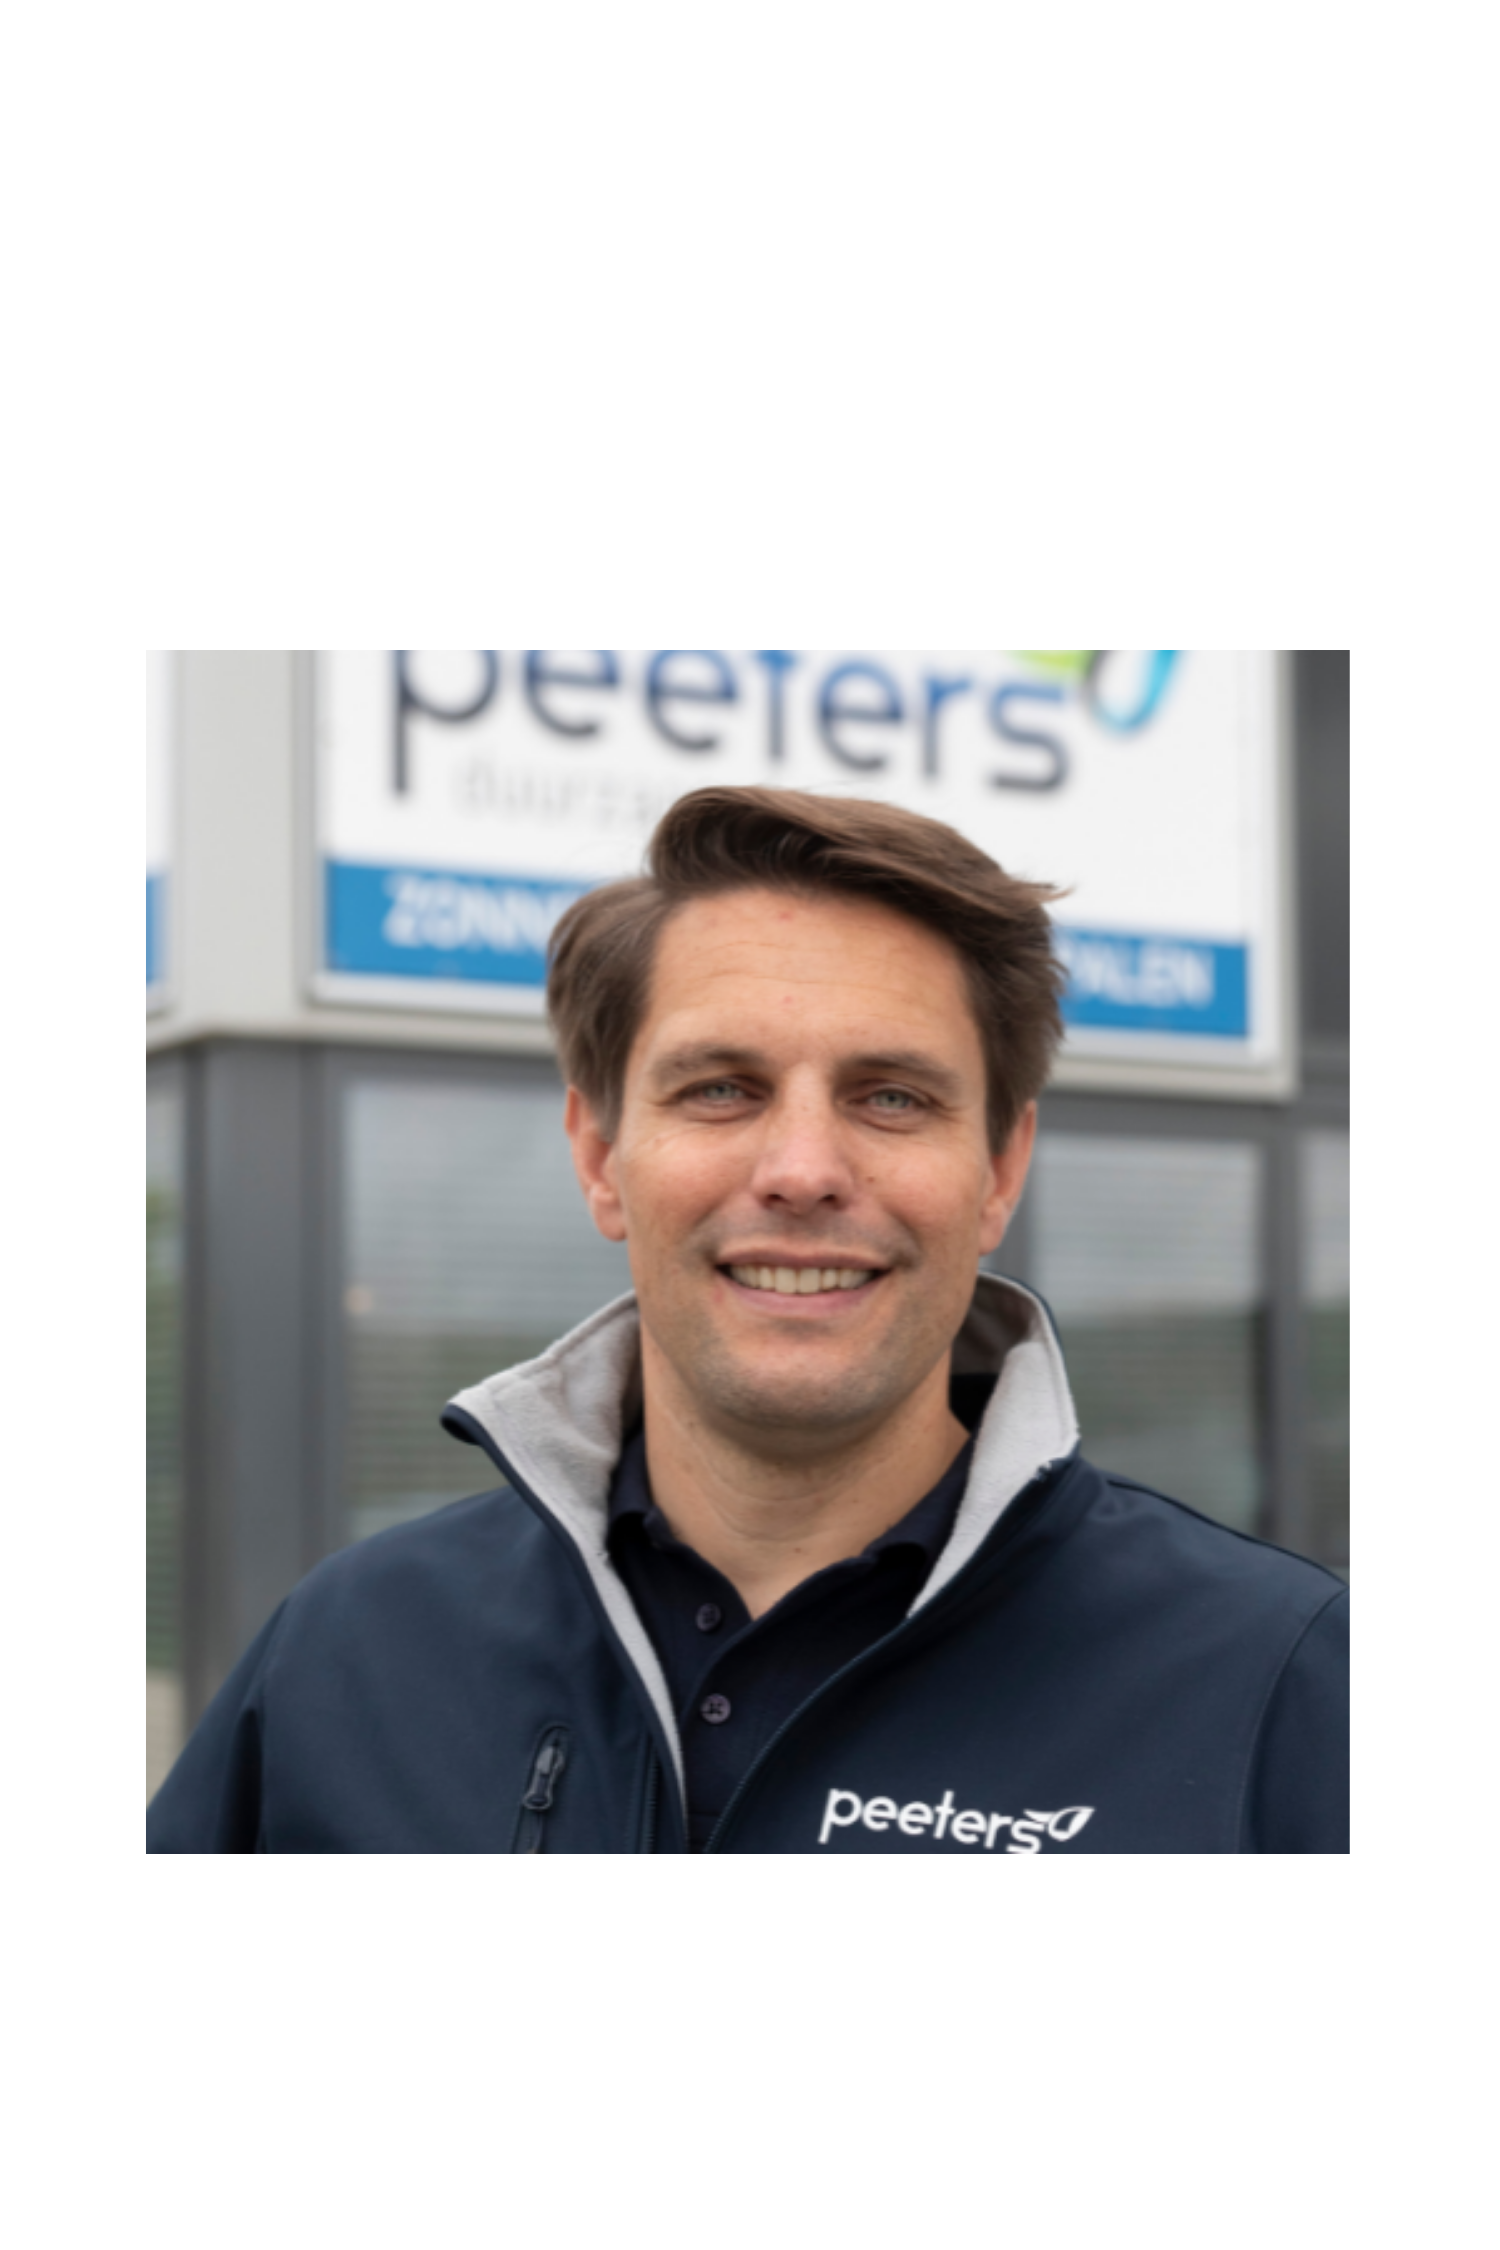 Eric Peeters